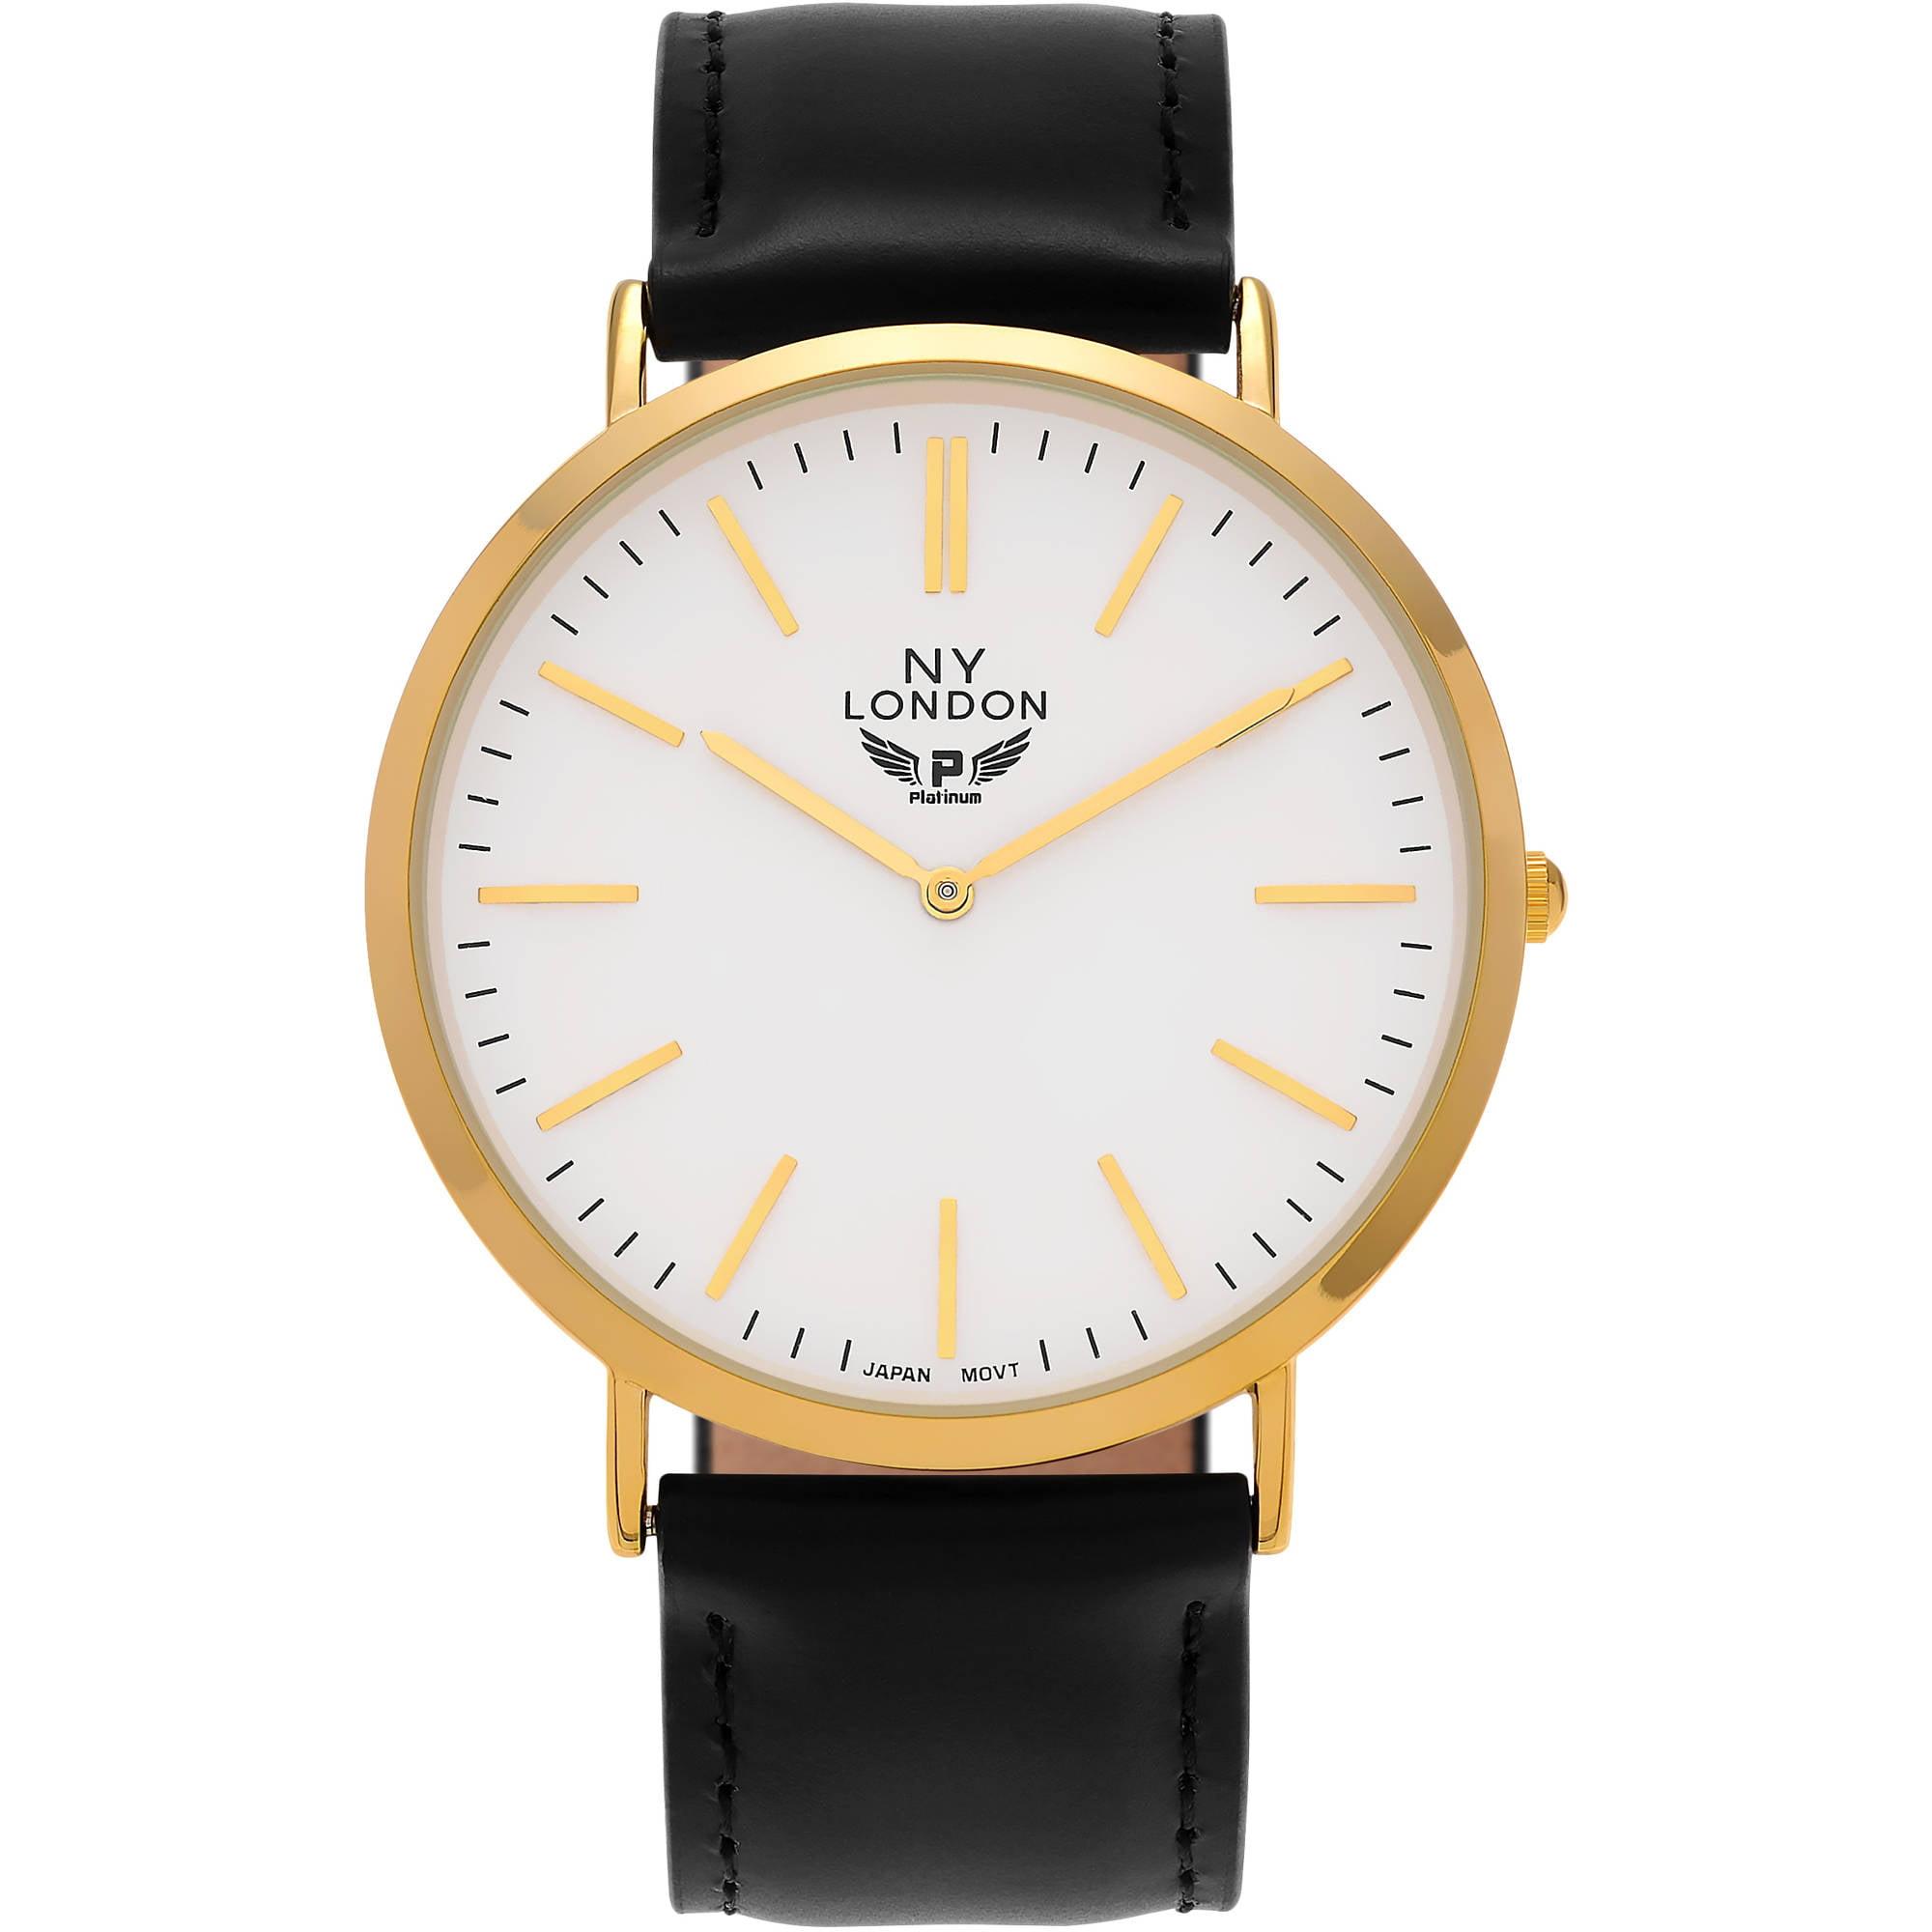 Image of Aktion Men's Faux Leather Round Face Tachymeter Strap Fashion Watch, Black/White